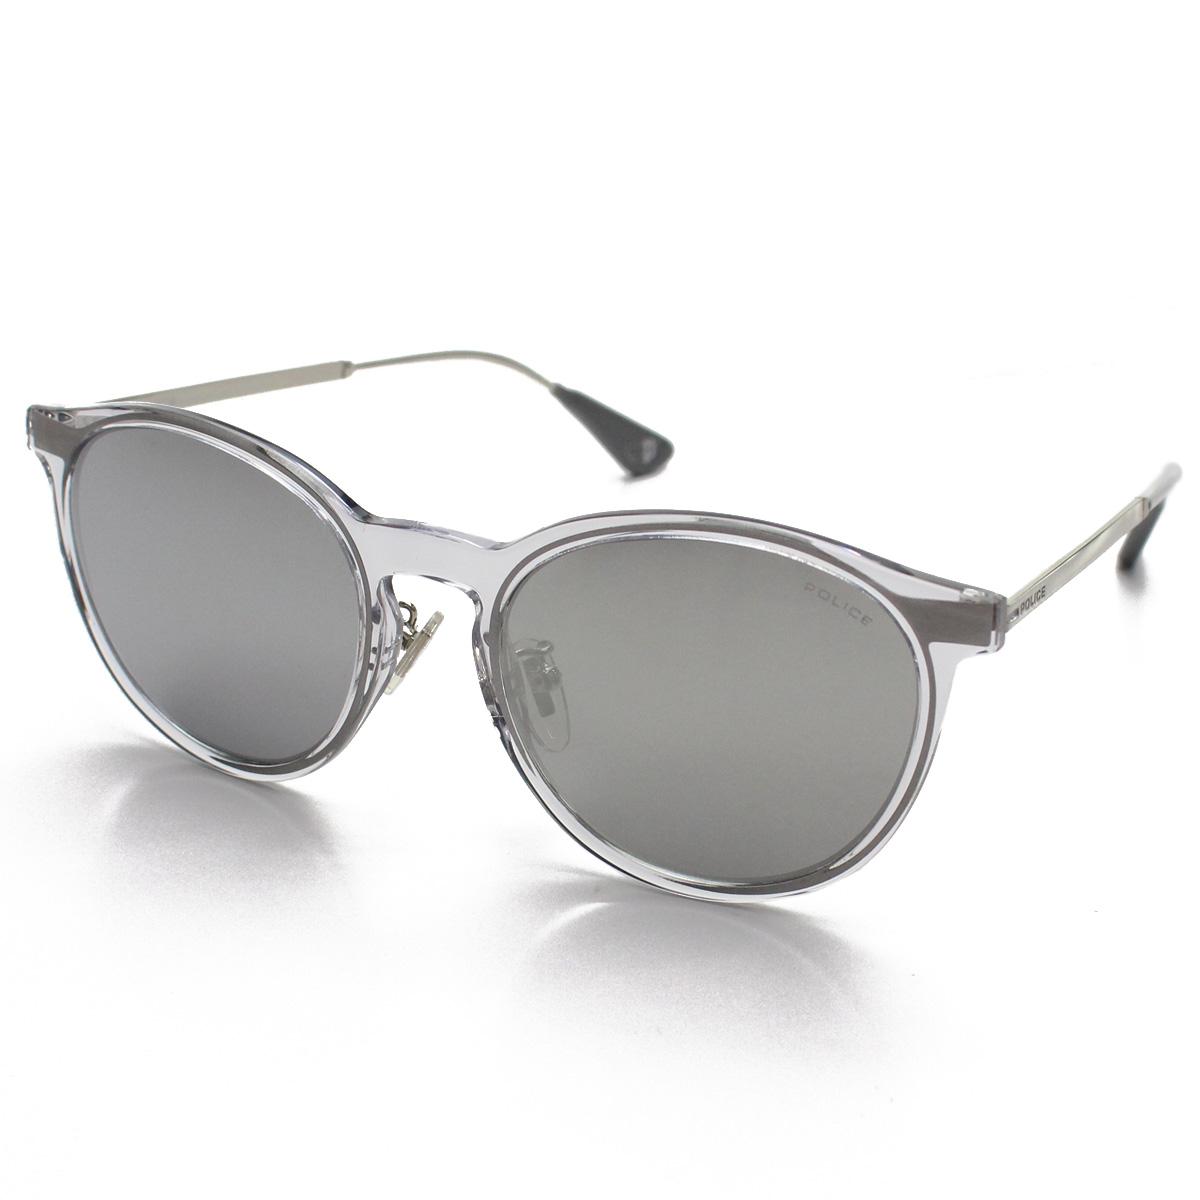 42cc05fffbe51 Sunglasses